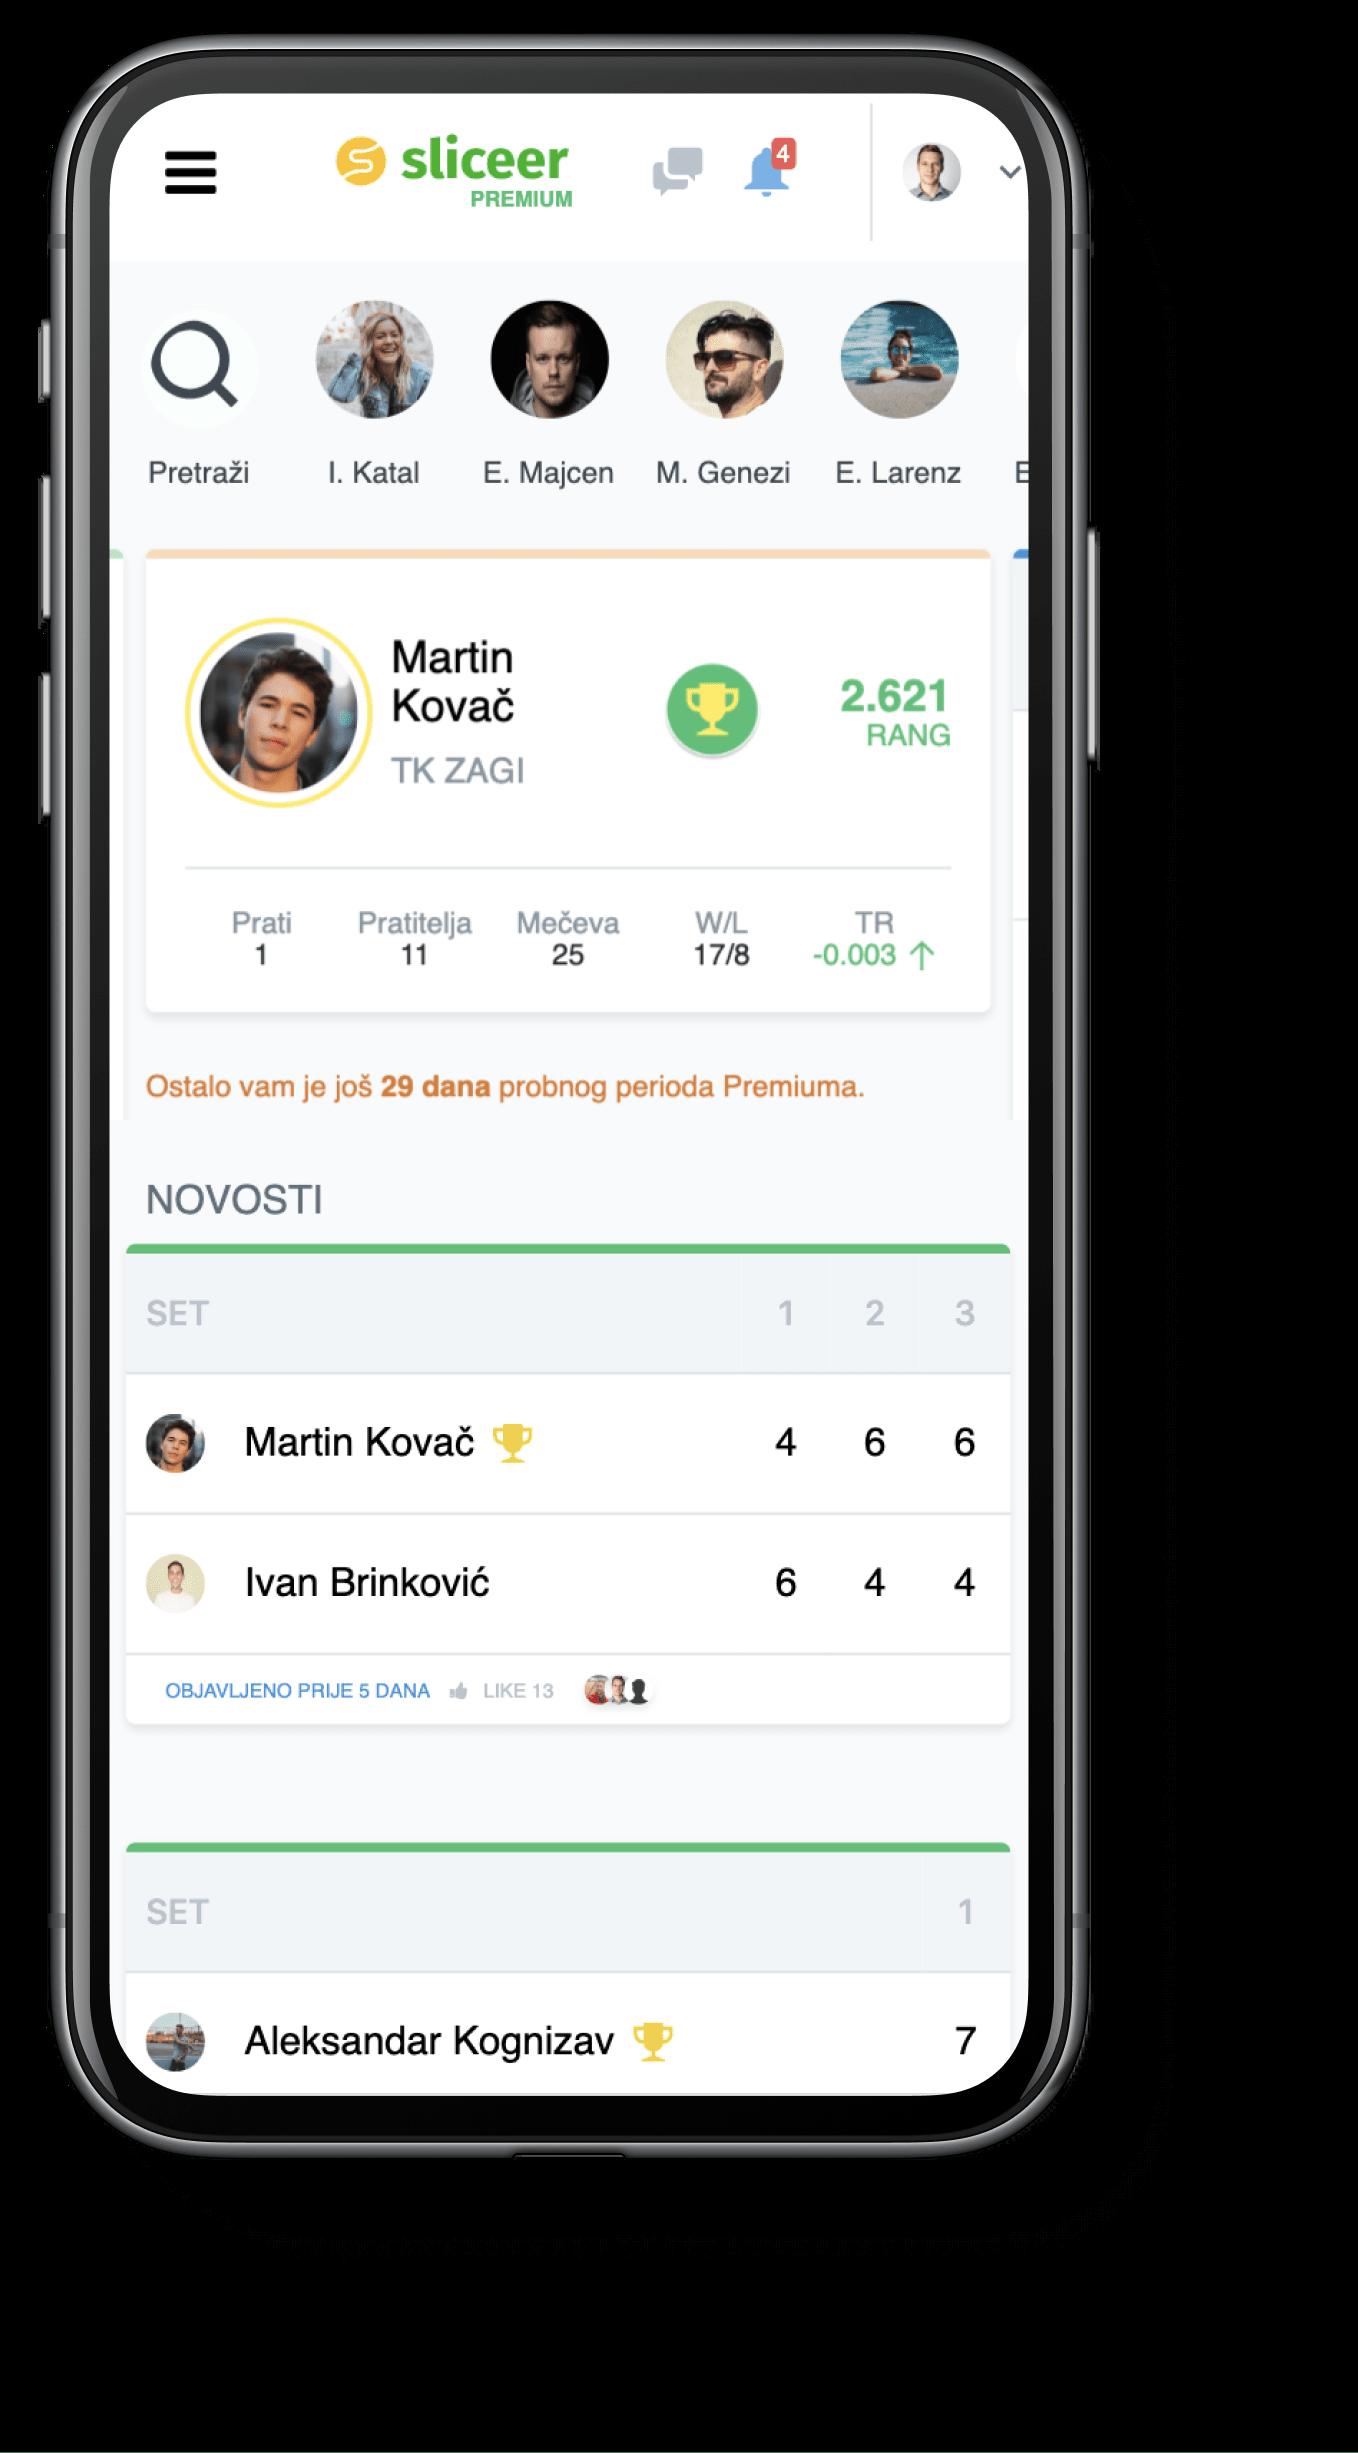 Sliceer mobilna aplikacija